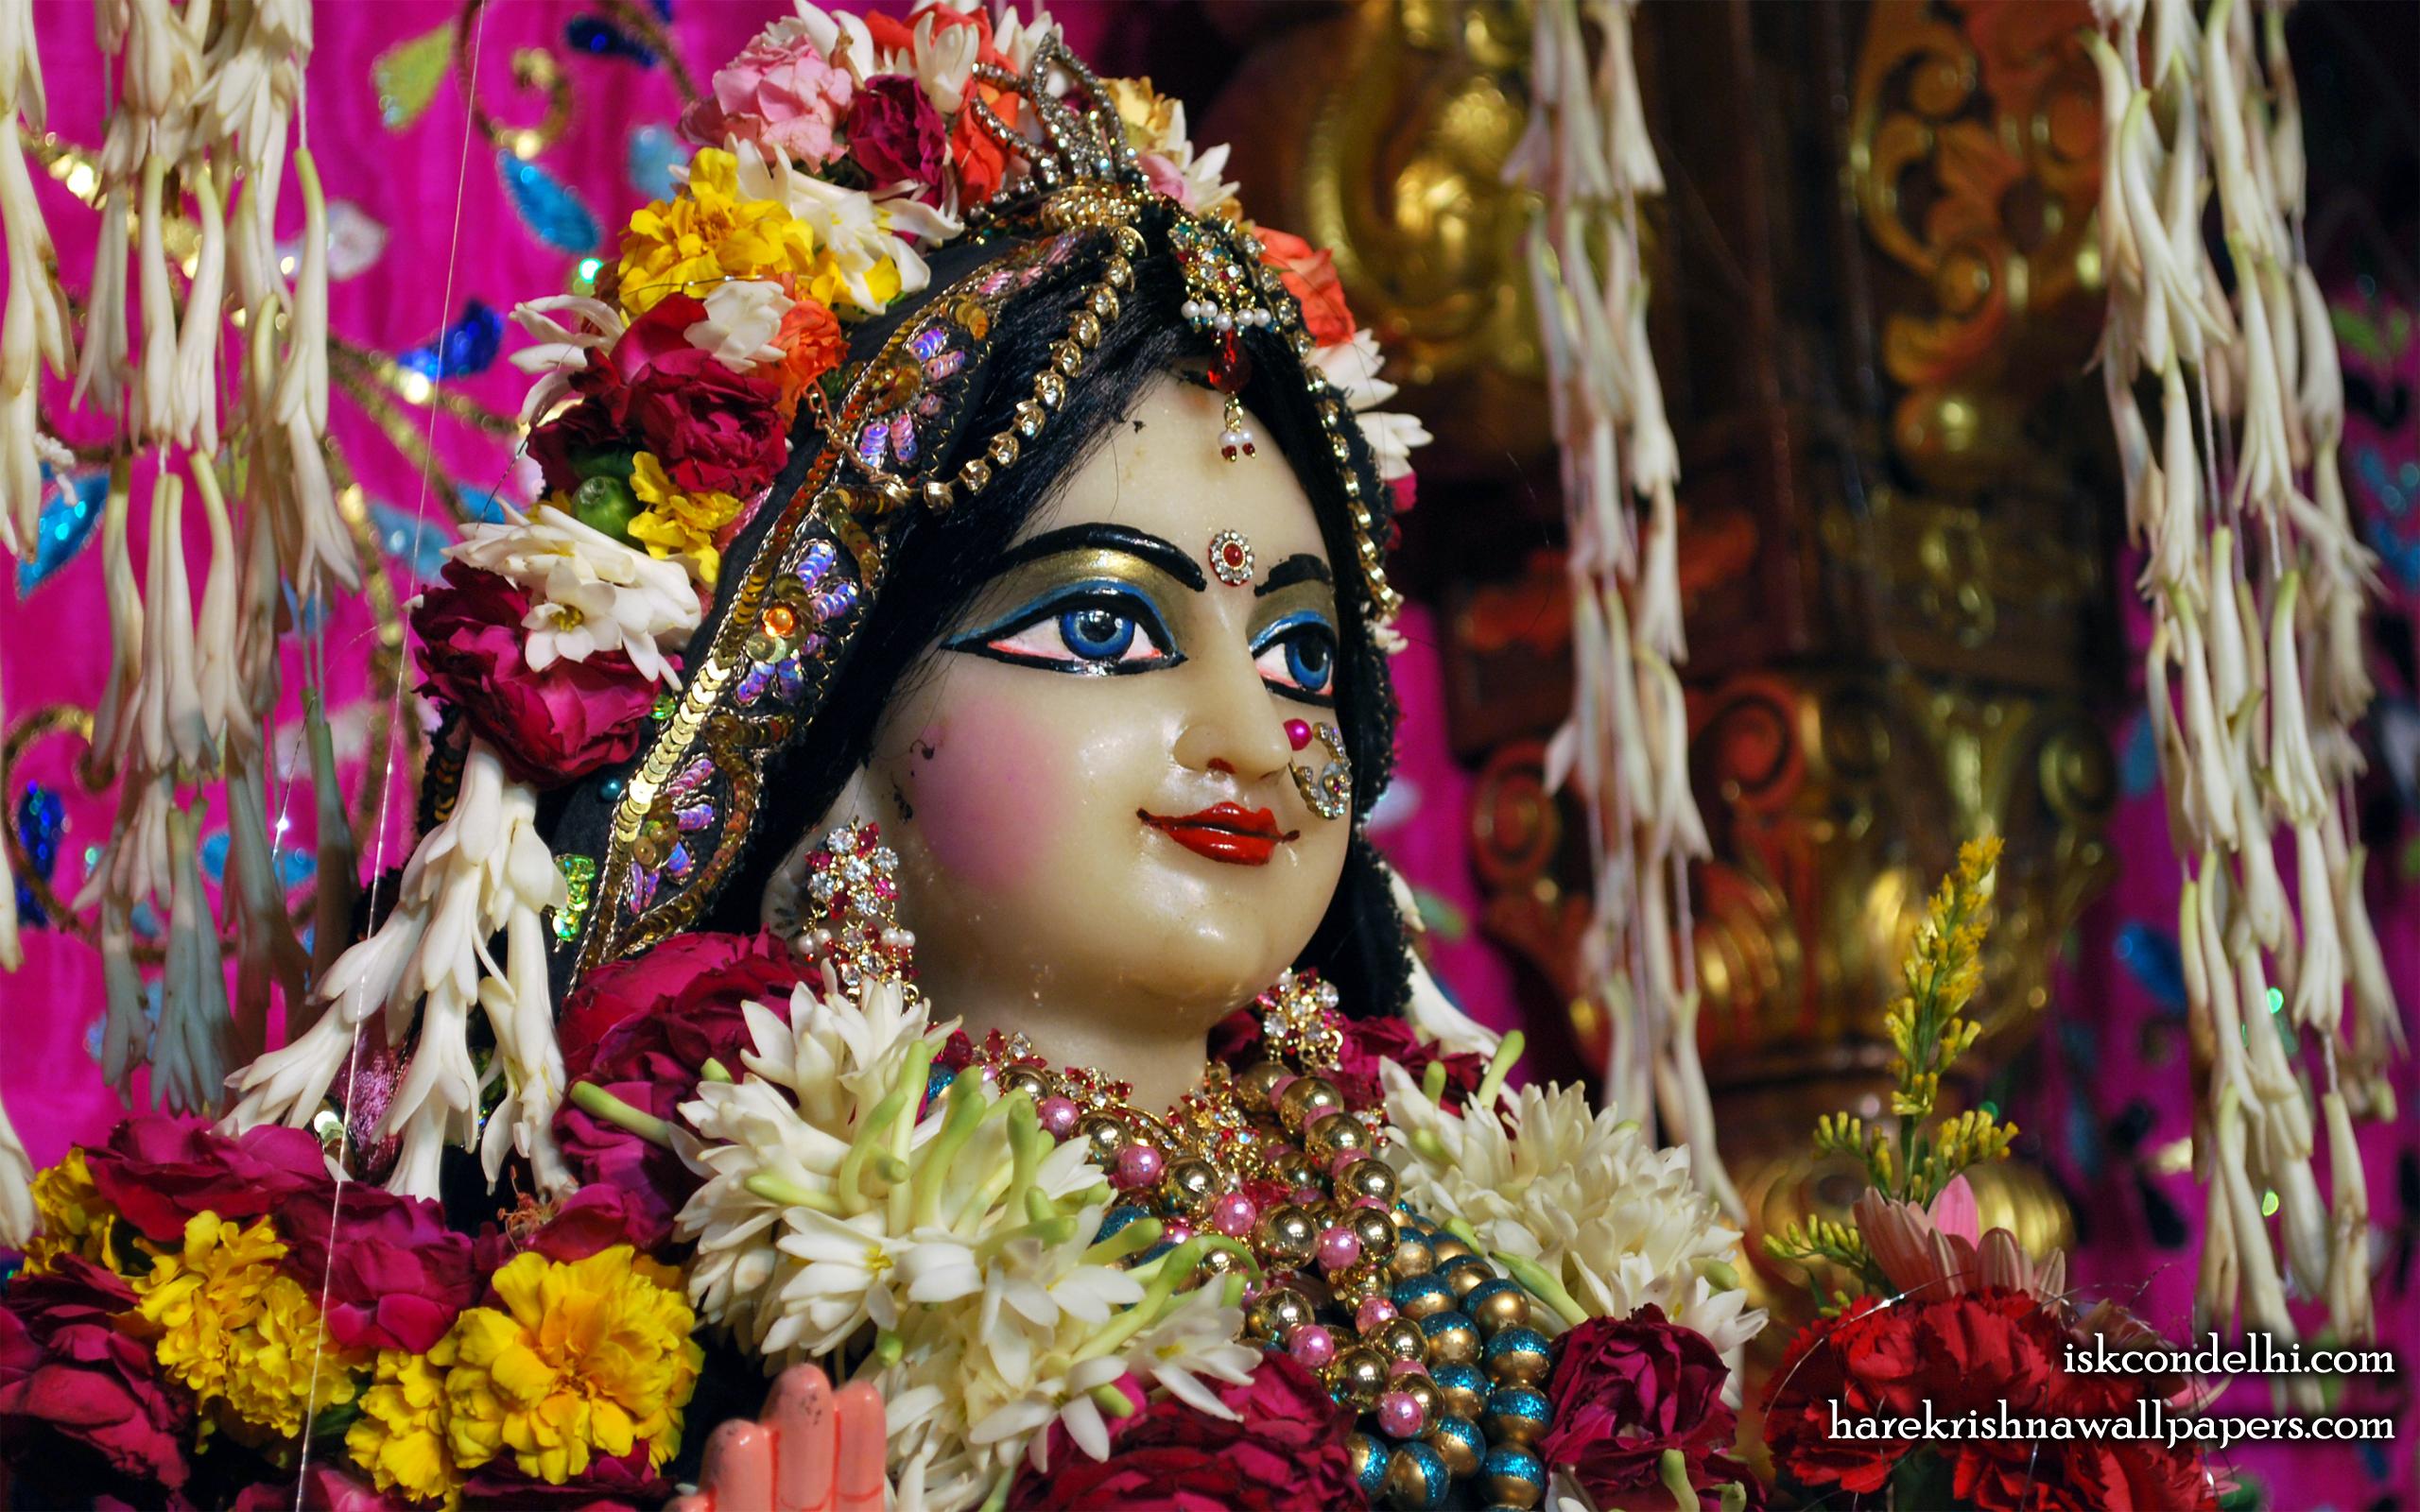 Sri Radha Close up Wallpaper (022) Size 2560x1600 Download